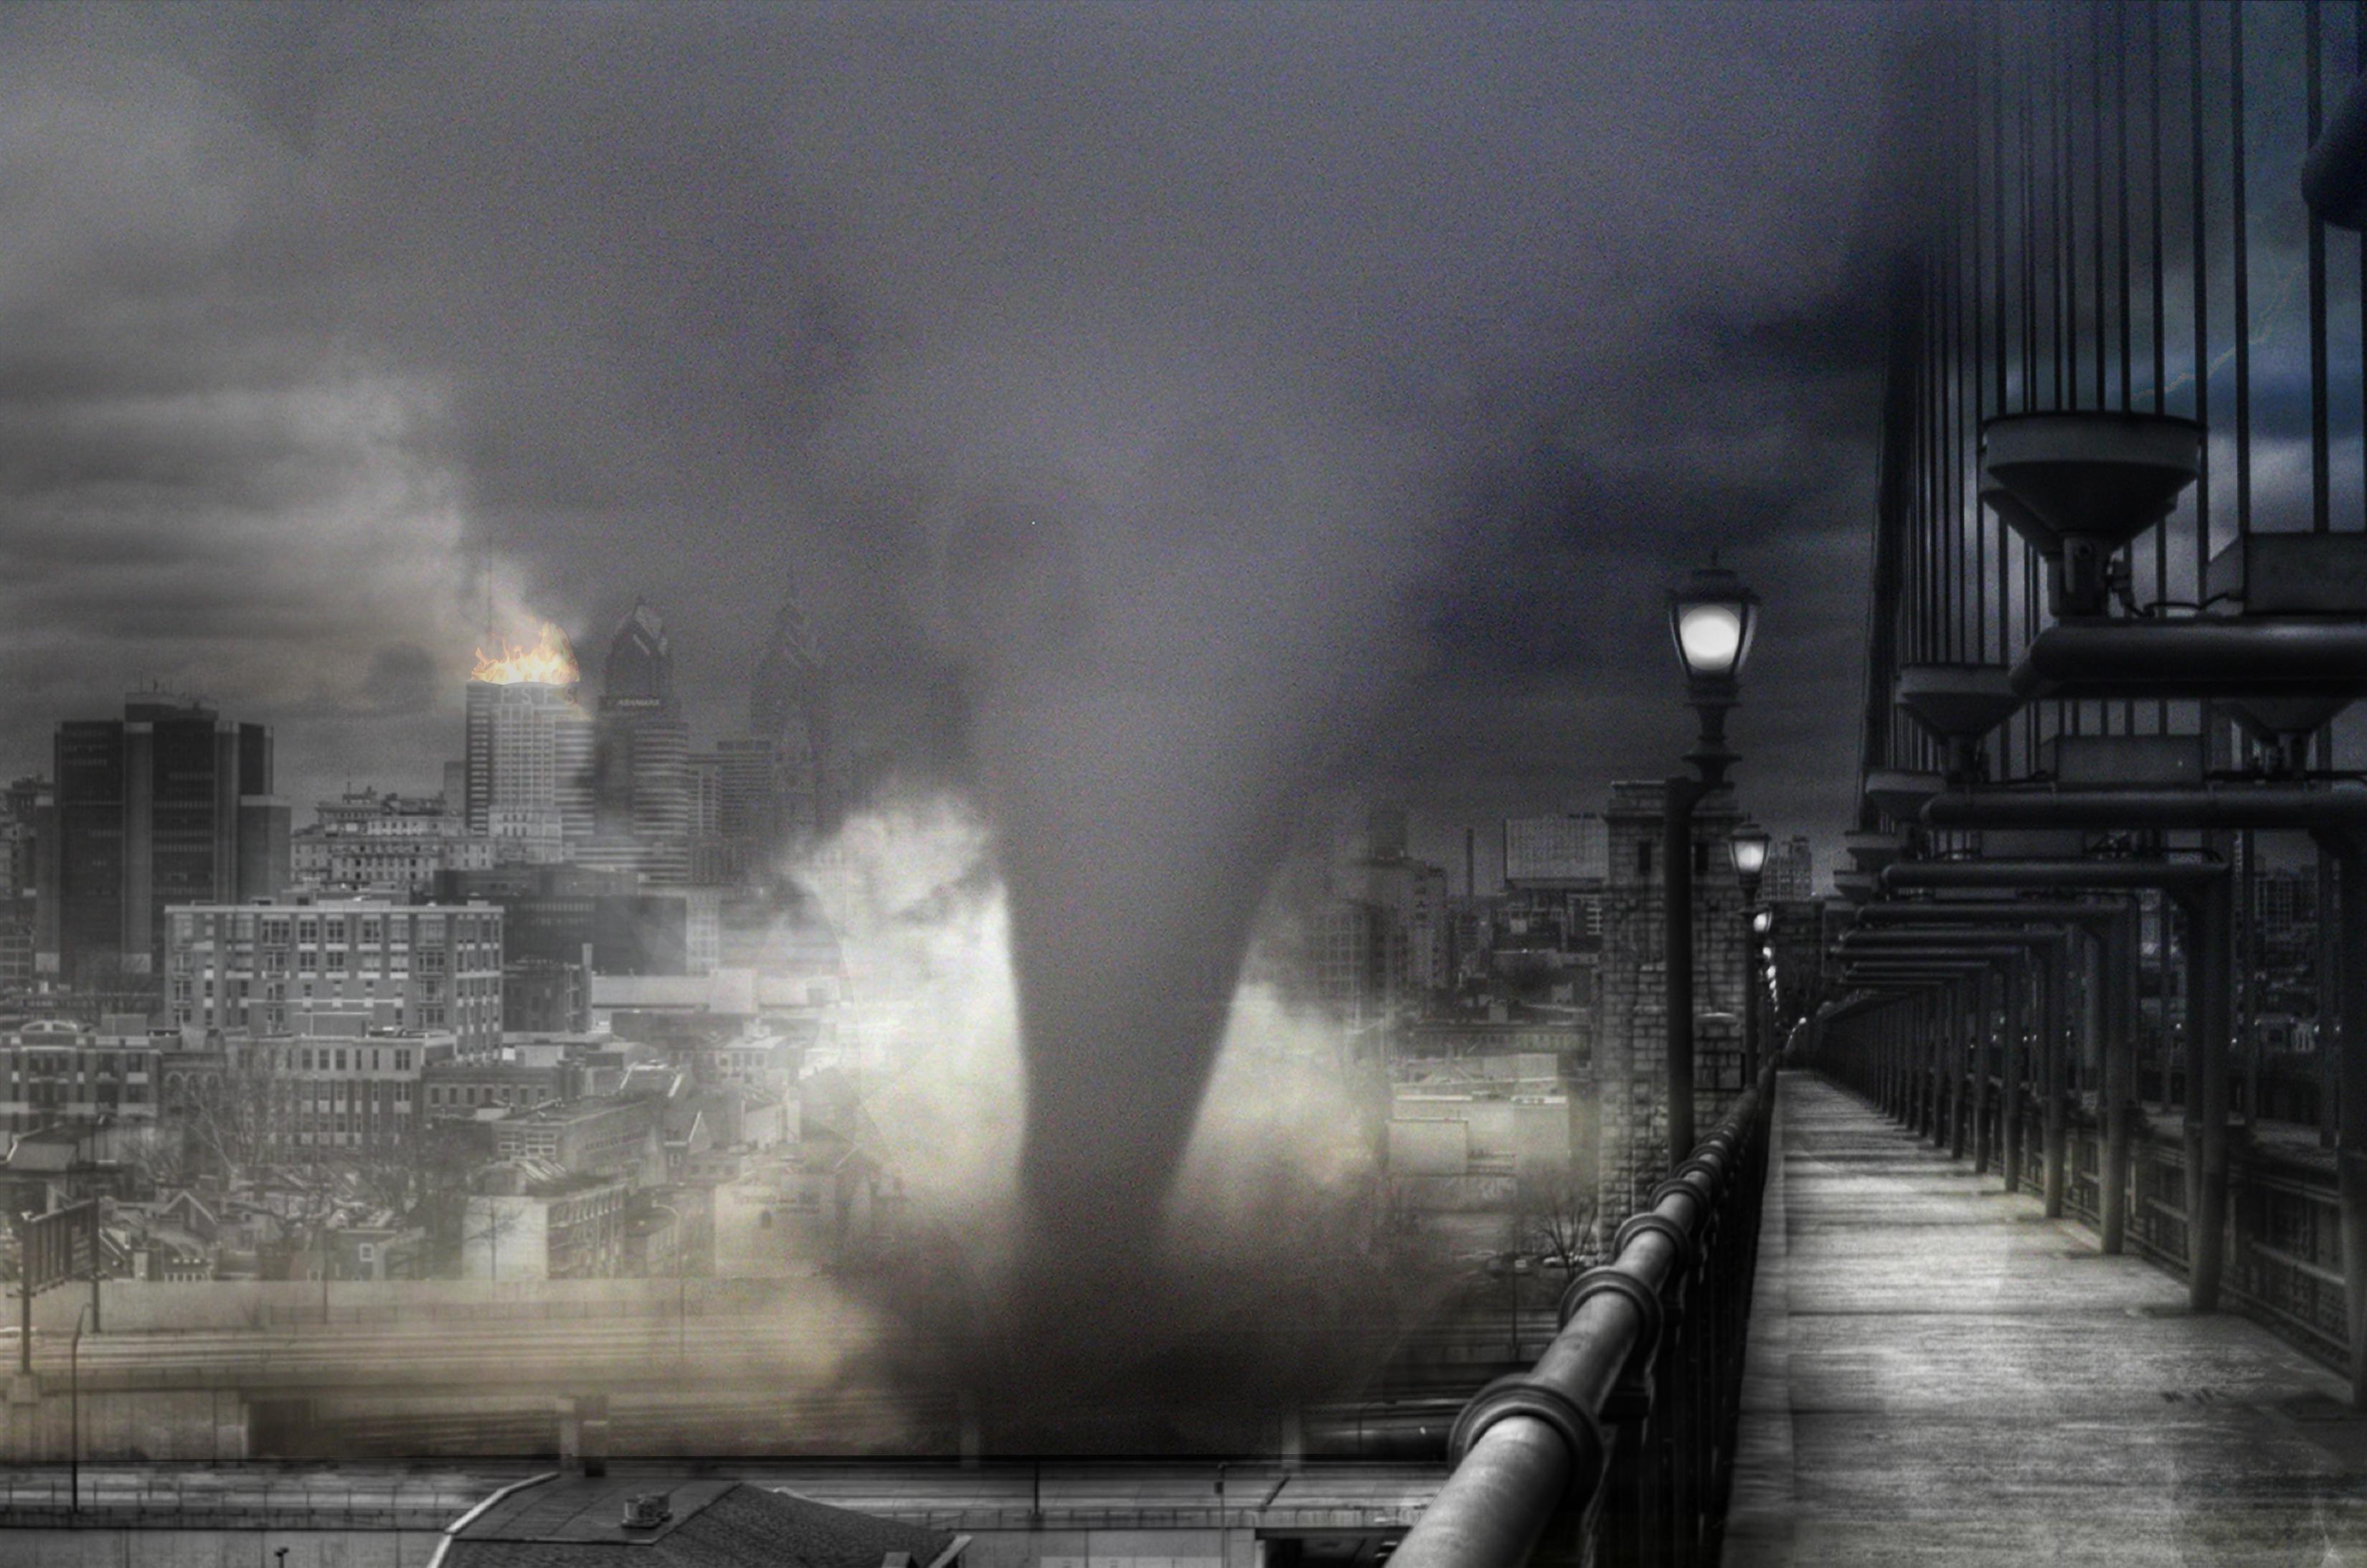 Nightmare in Philadelphia by JMDGraphX